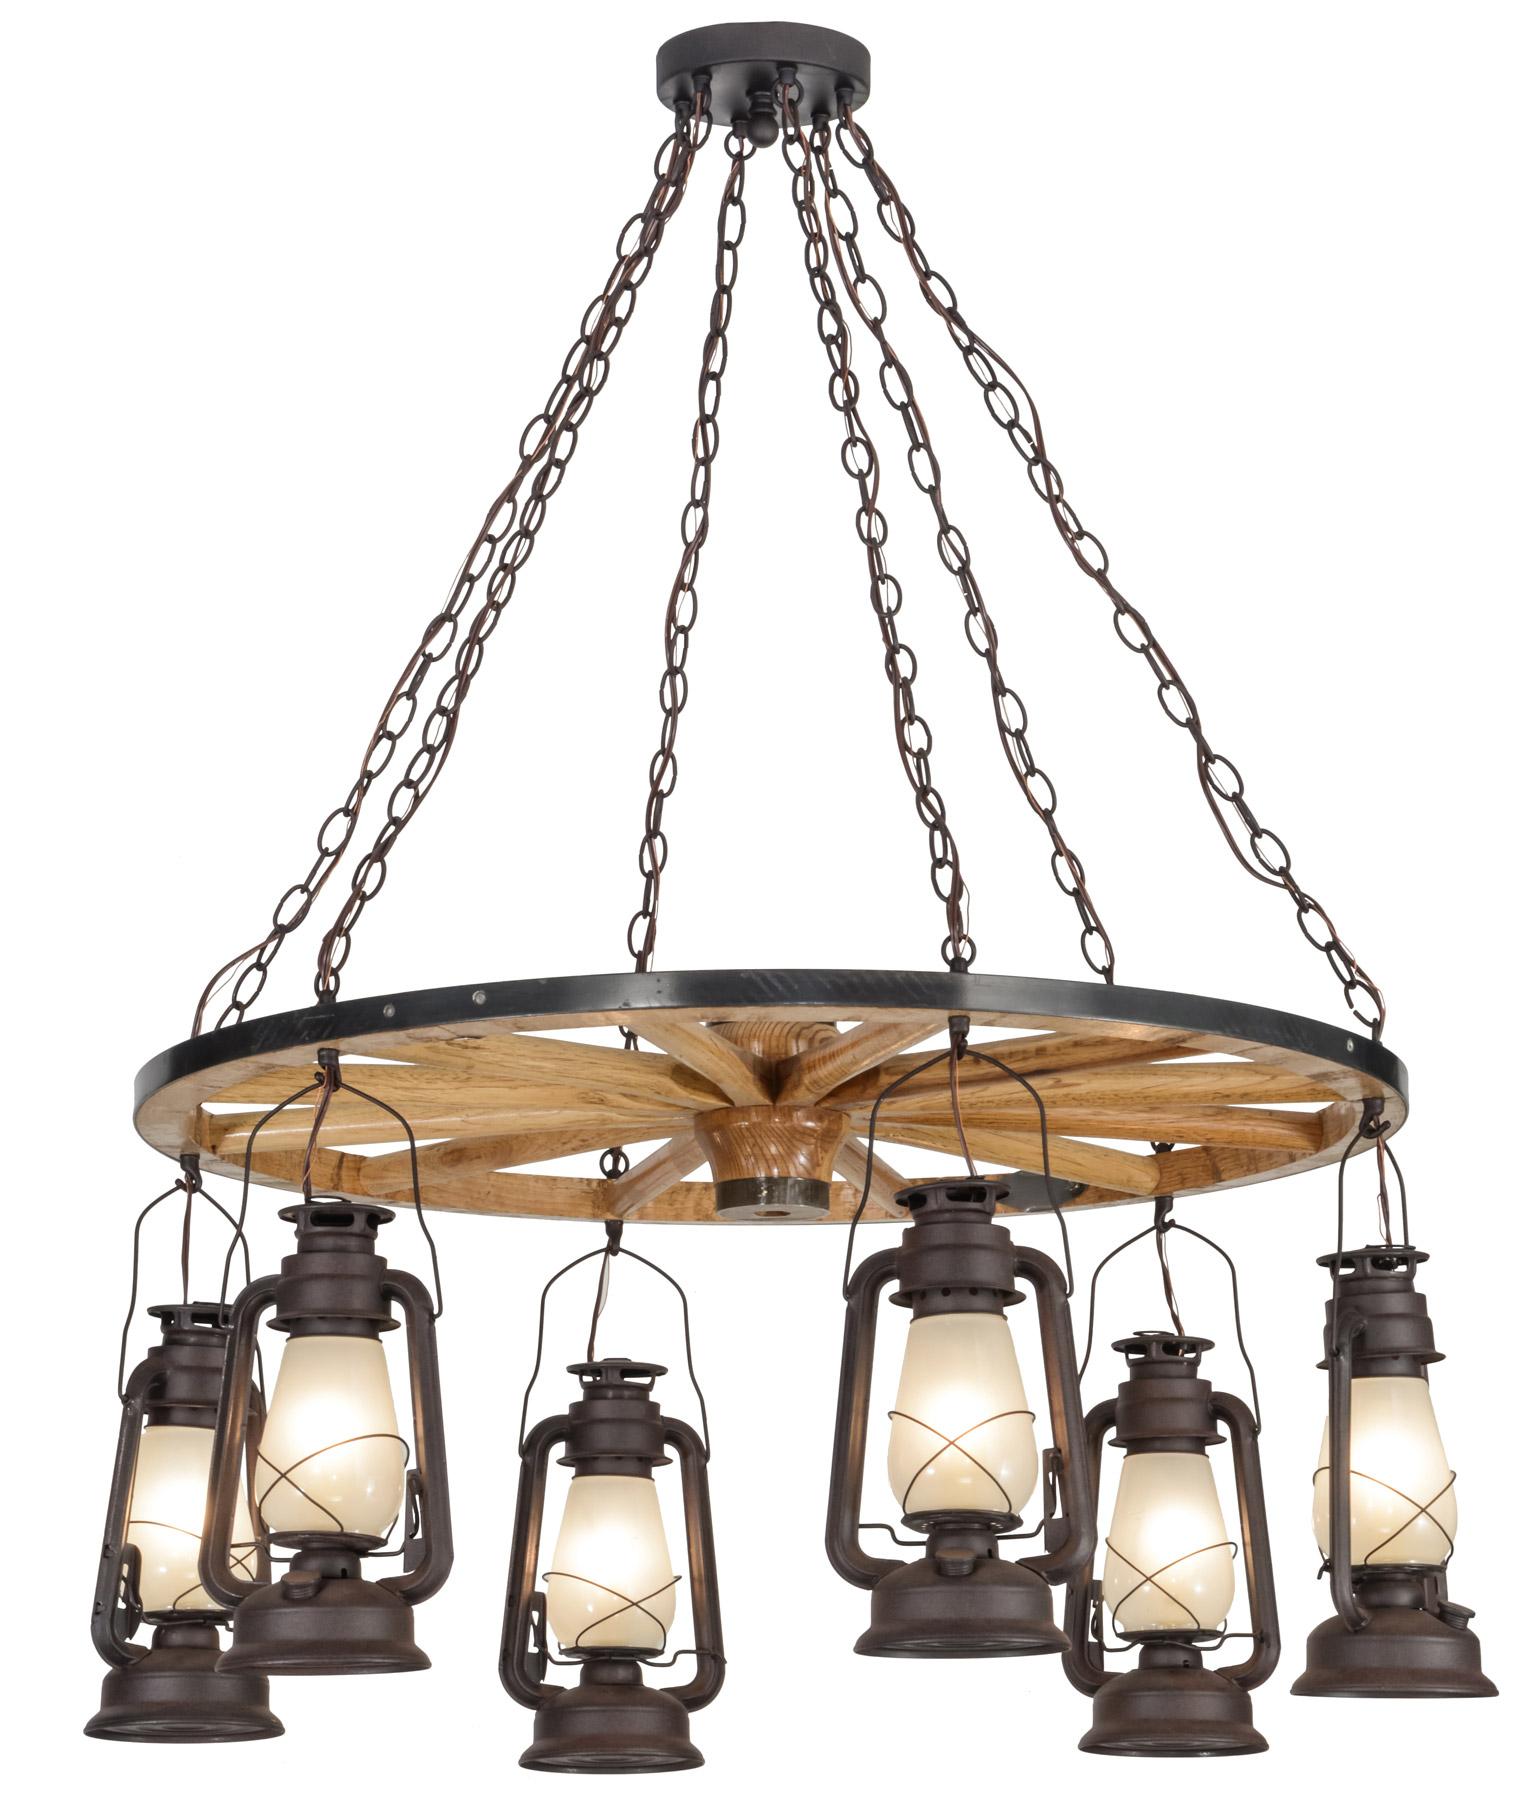 Meyda 151906 Miners Lantern Wagon Wheel Chandelier